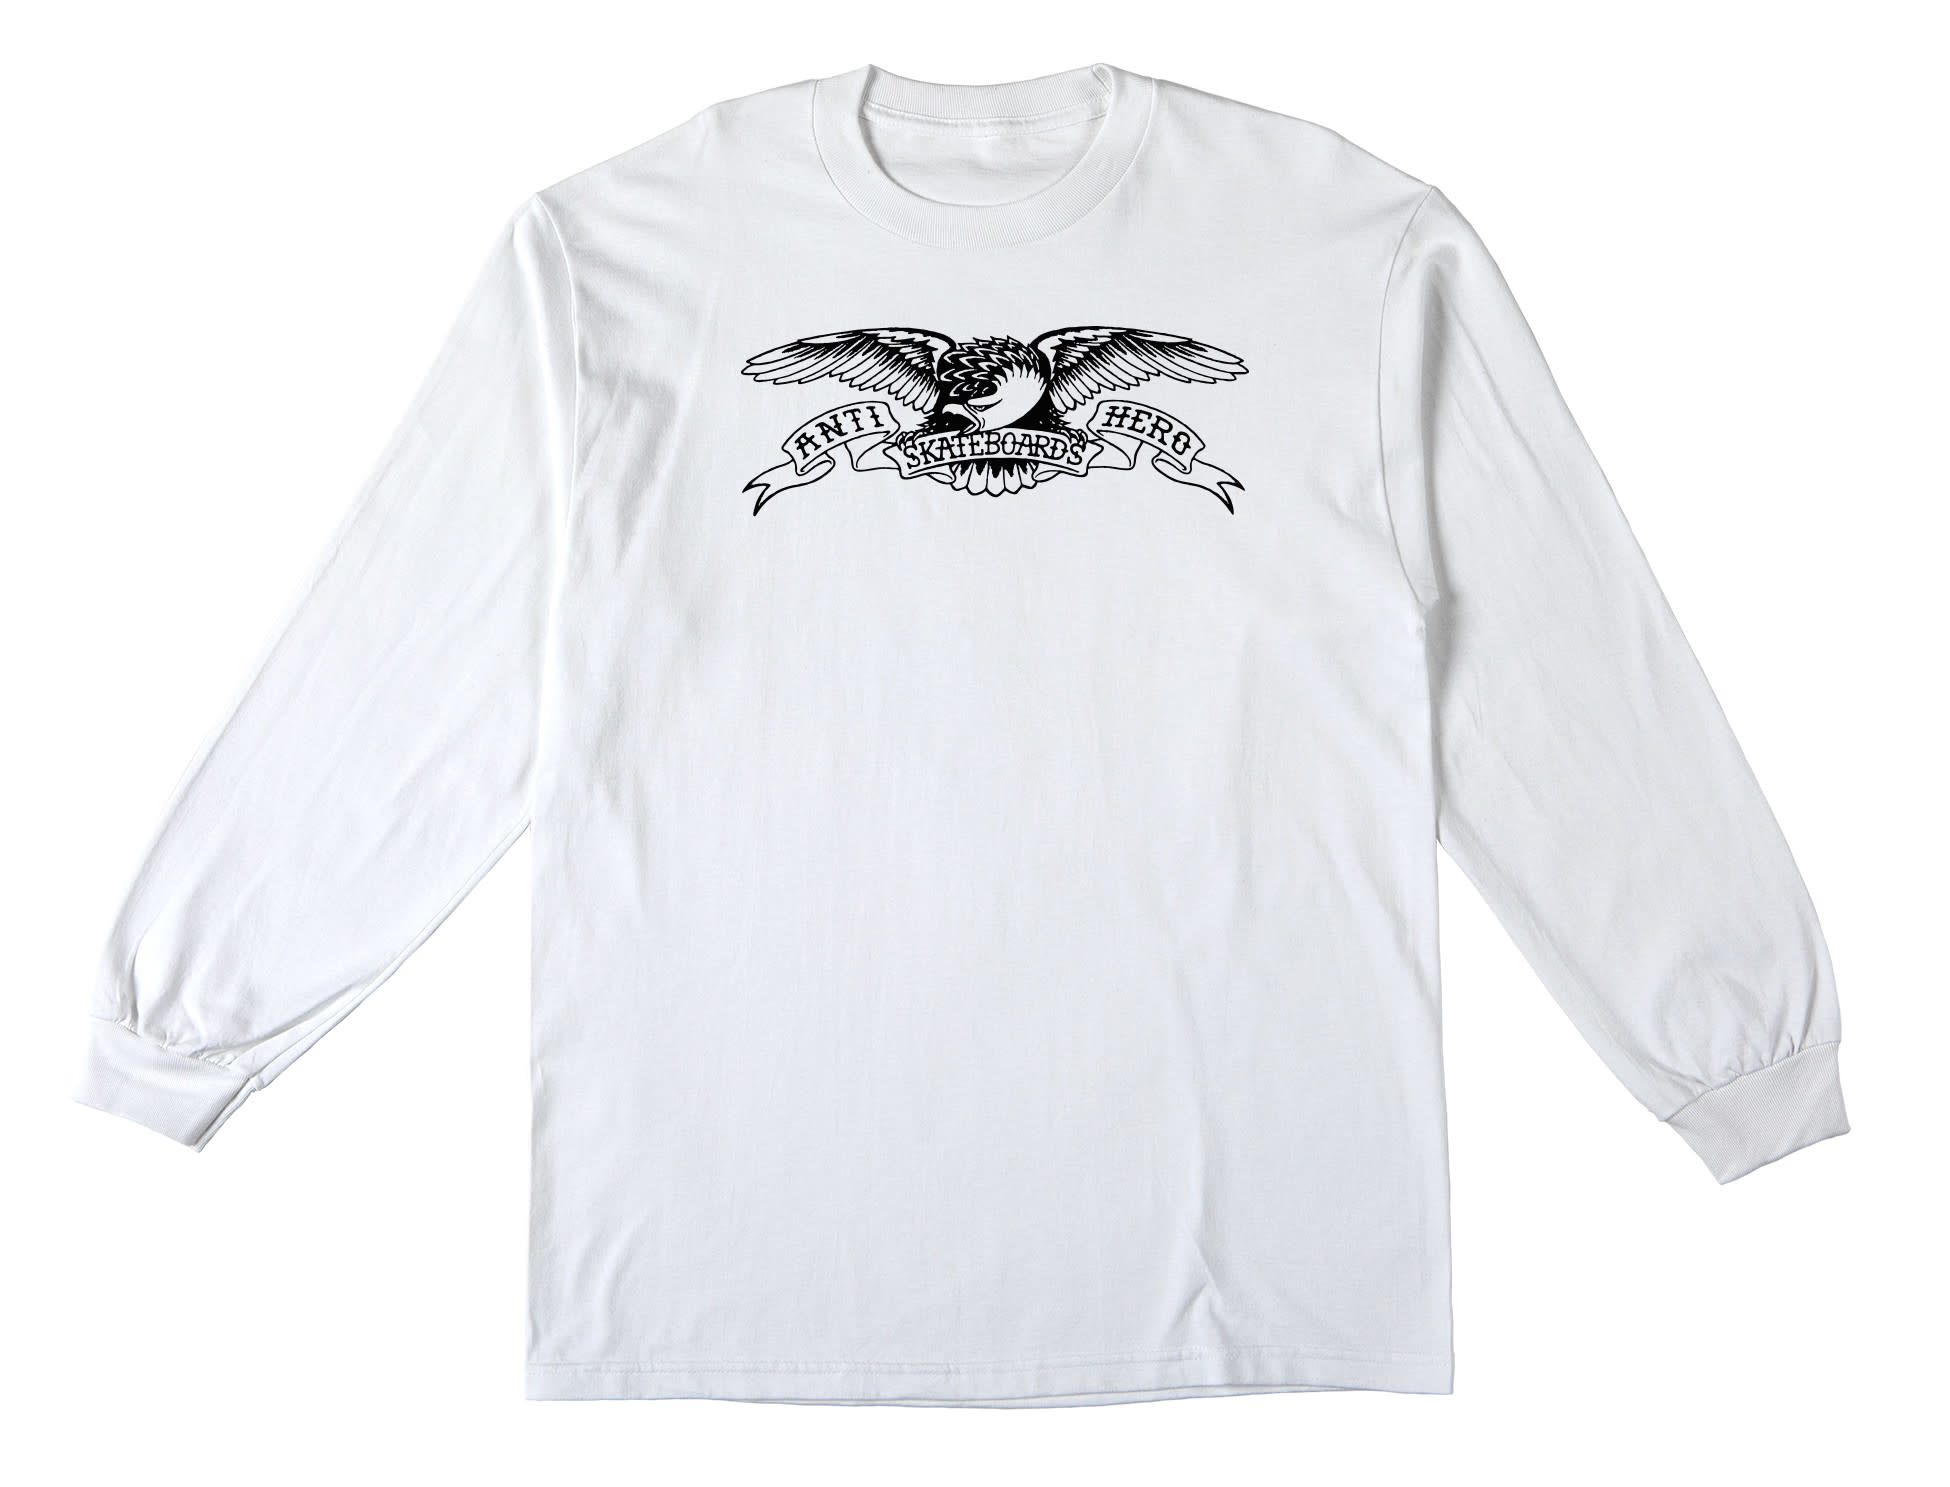 Anti Hero Basic Eagle L/S White/Black